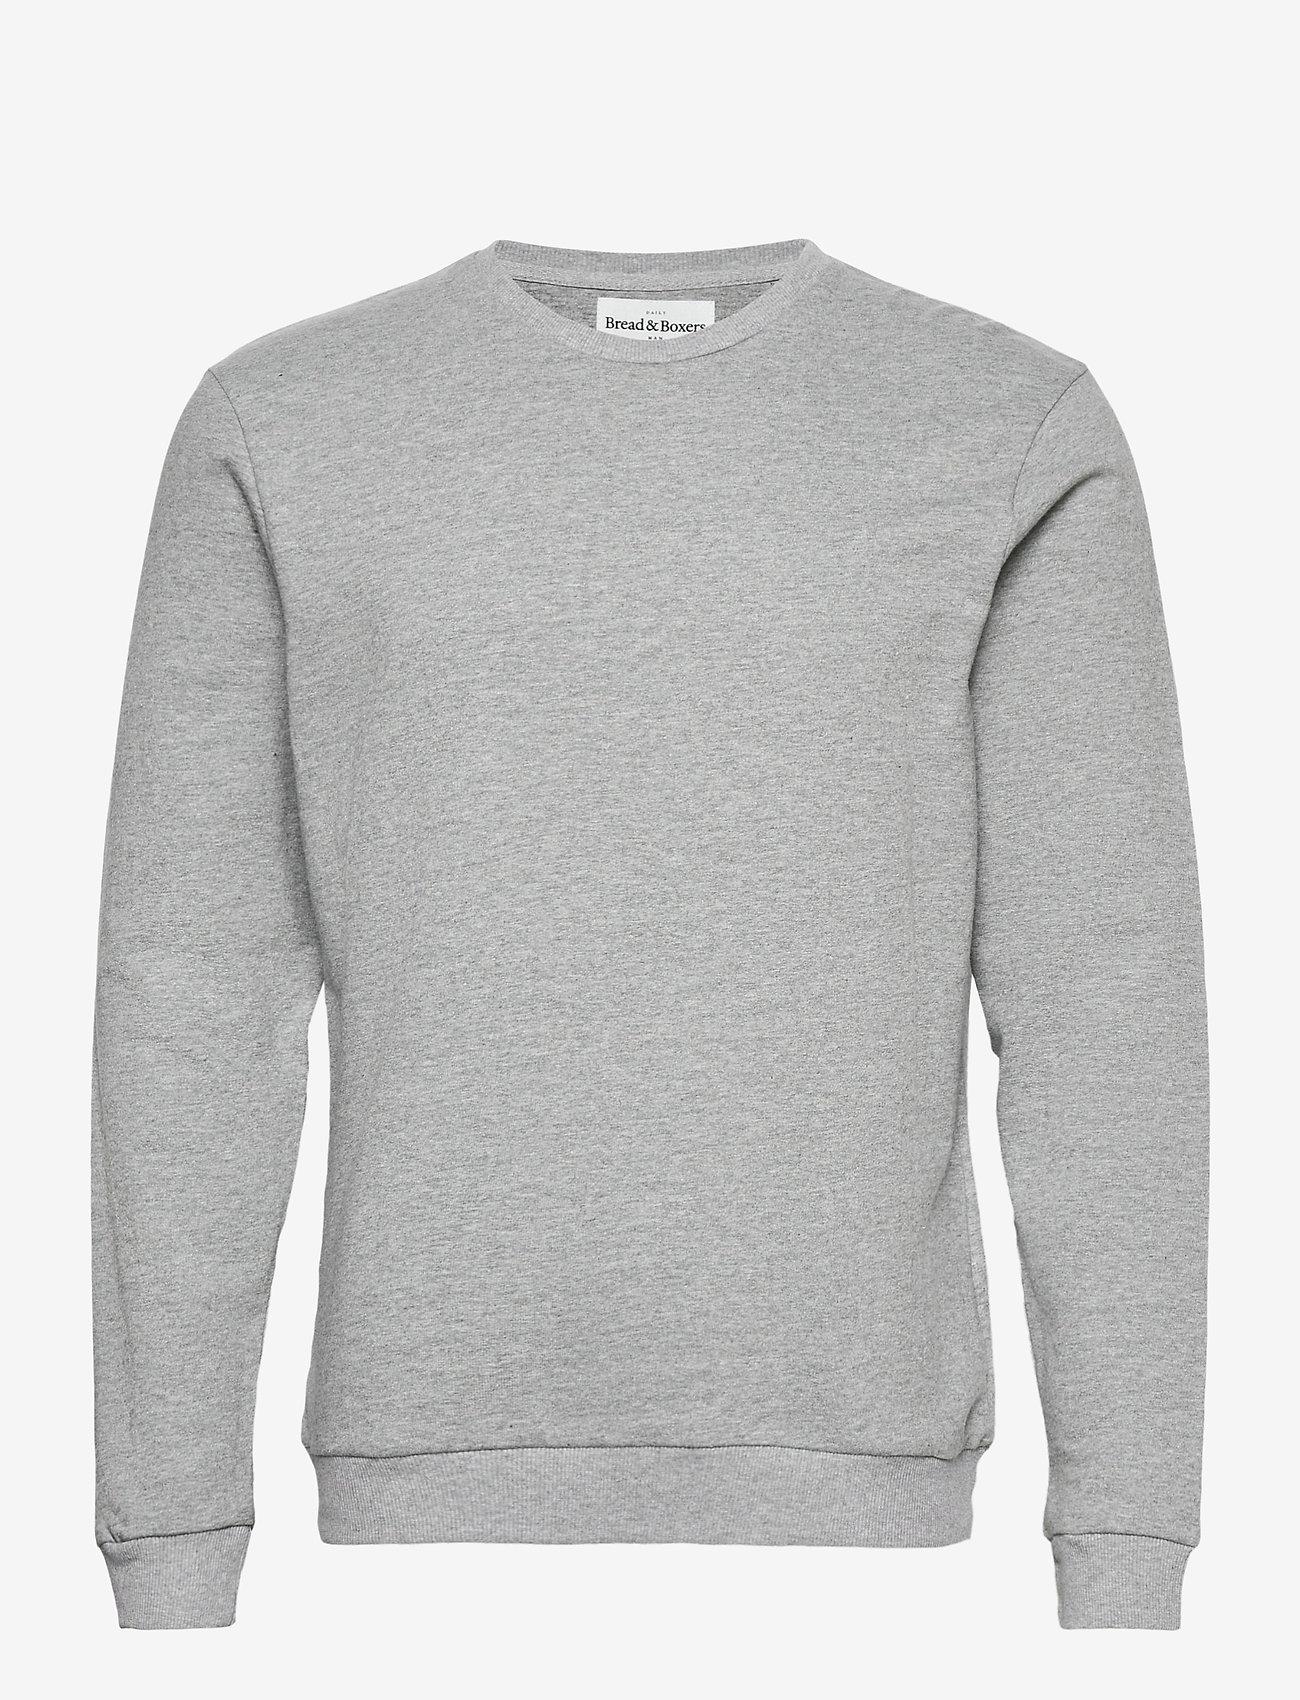 Bread & Boxers - Sweatshirt - truien - grey melange - 0